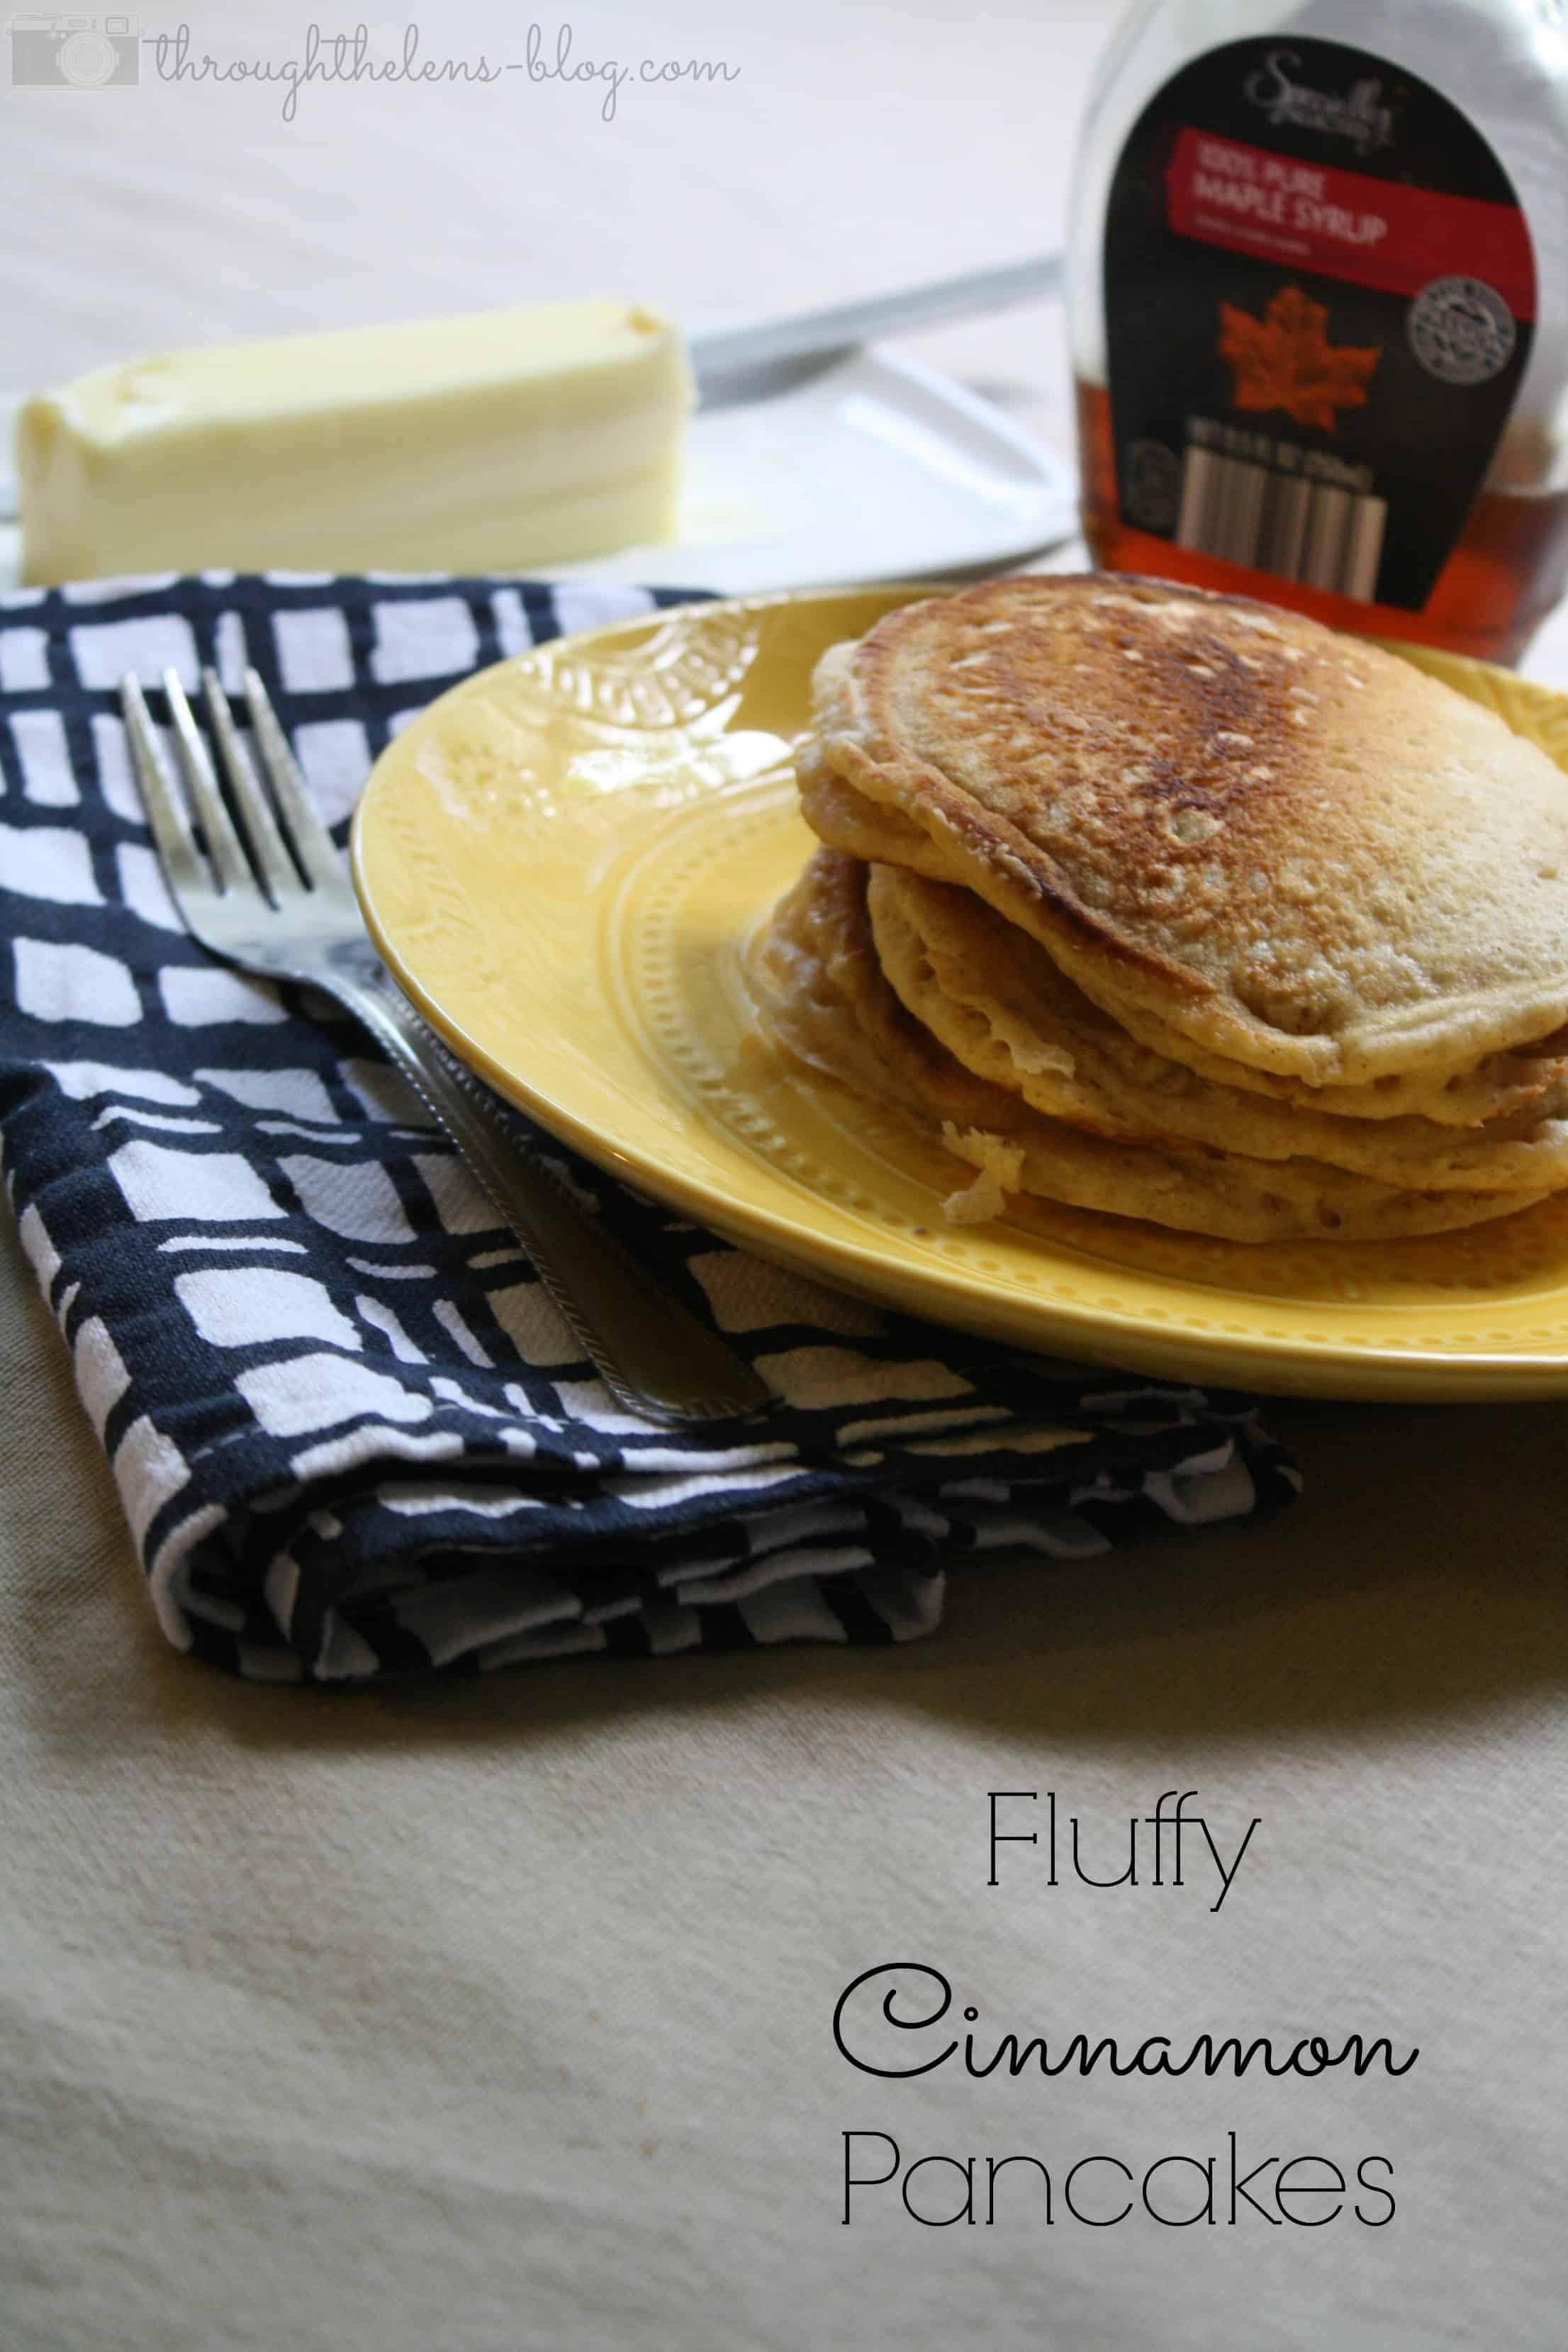 Fluffy Cinnamon Pancakes